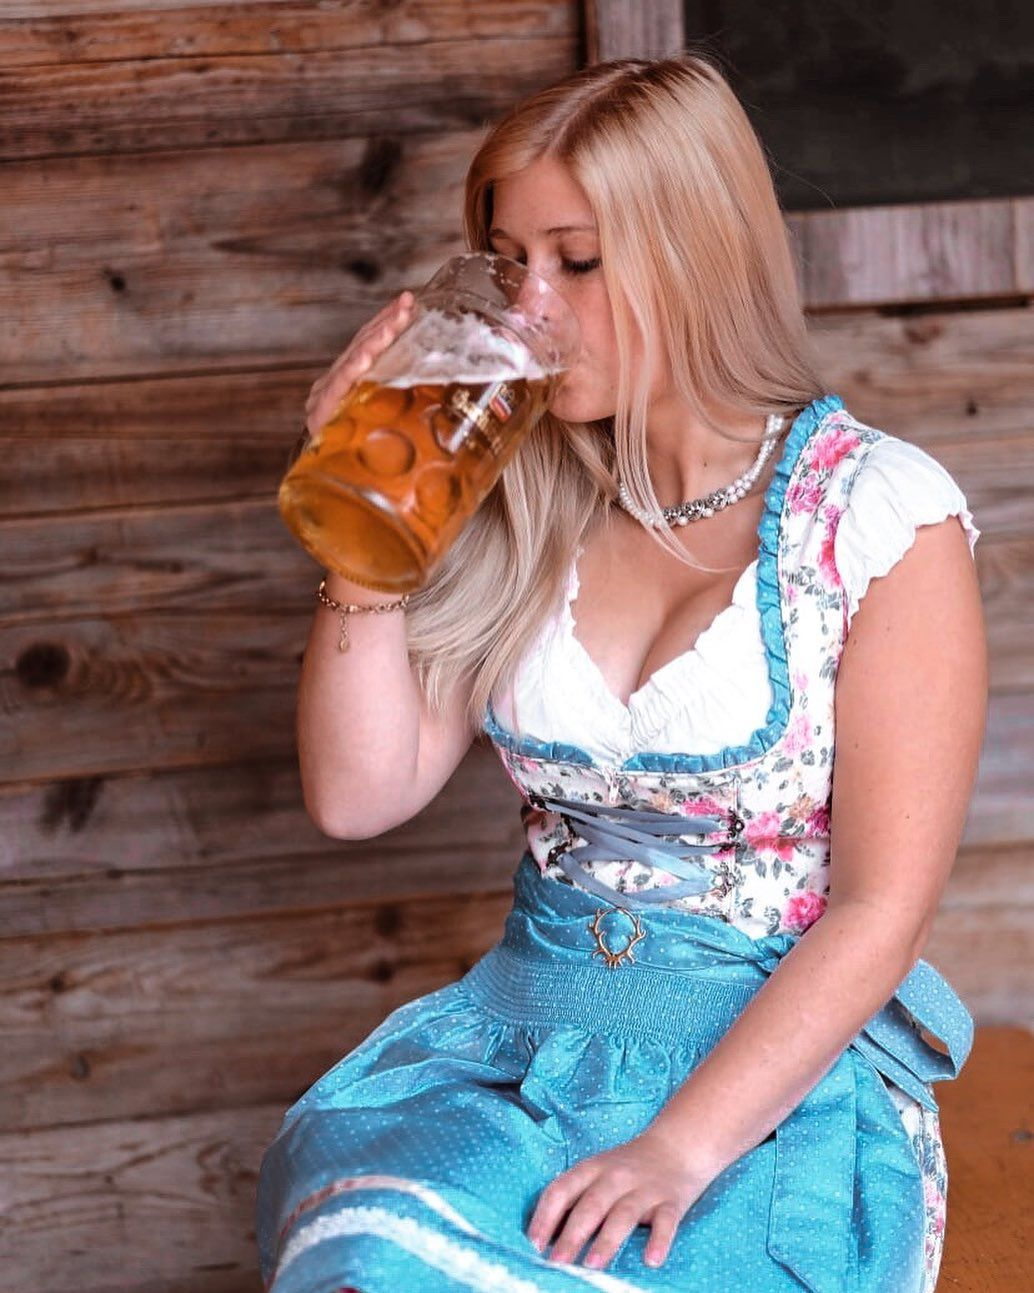 Dirndl | Dirndl, Wearing dress, Passau